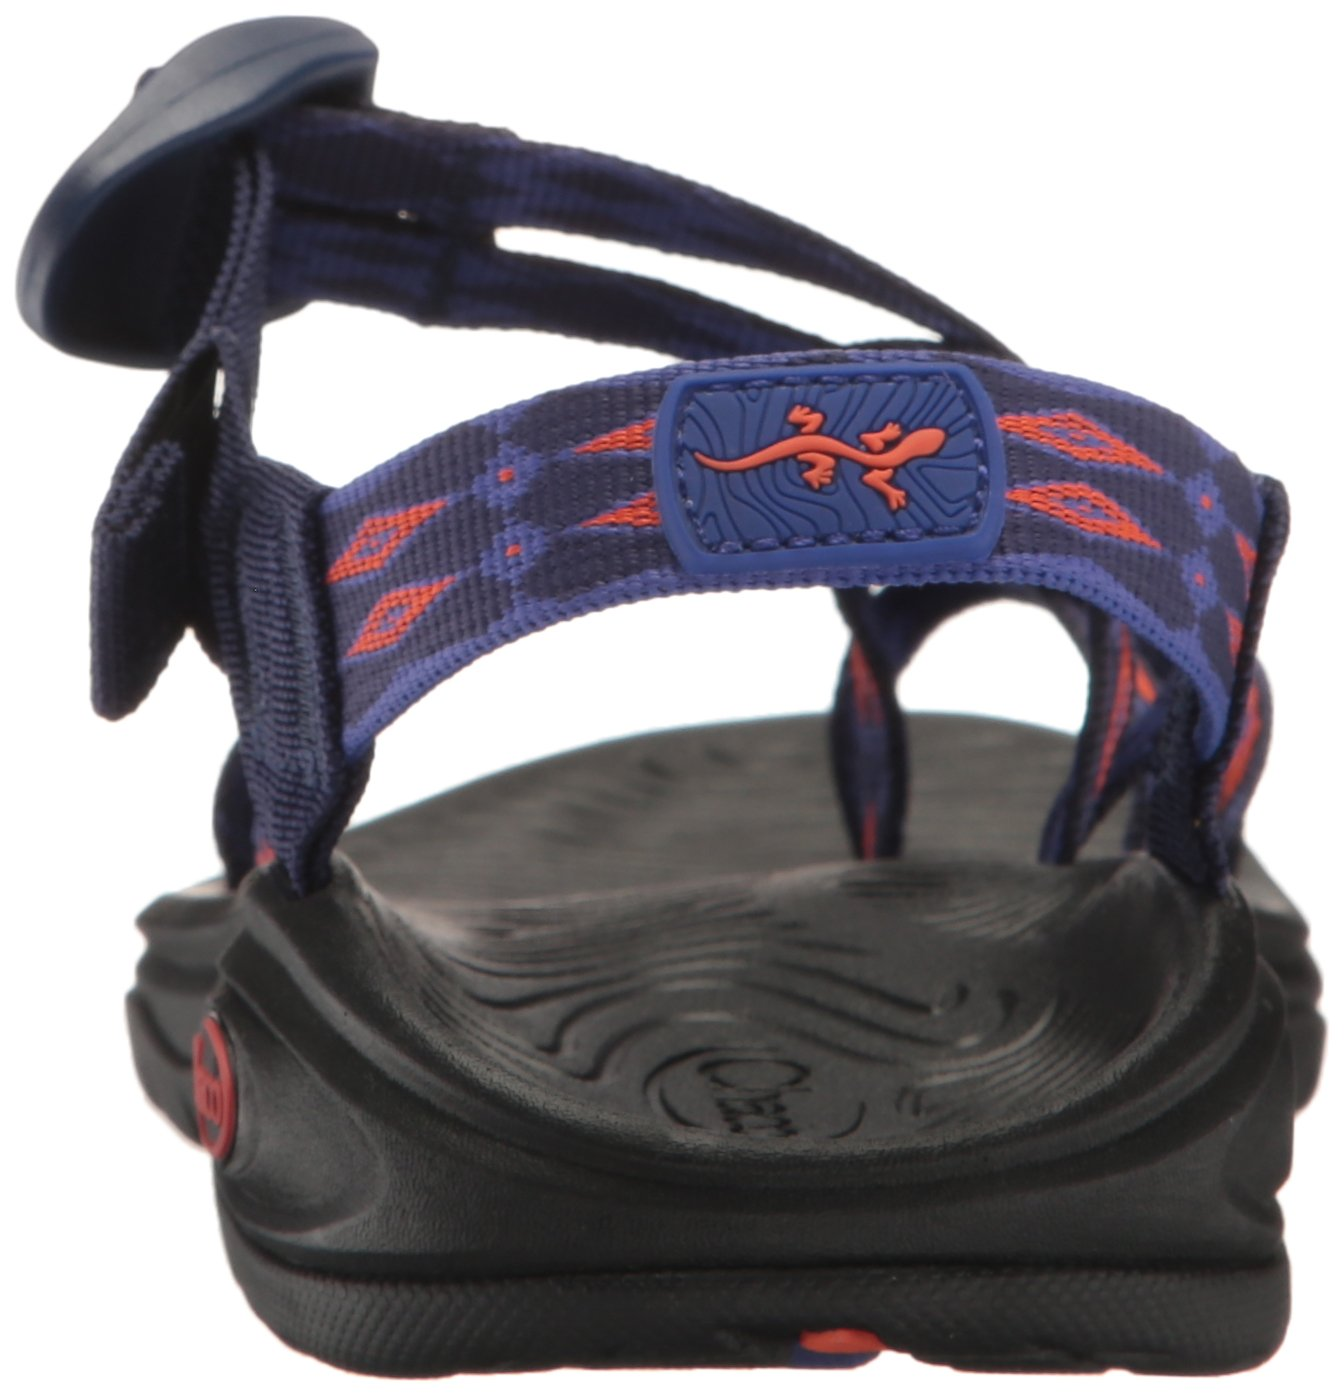 Chaco Sandal Women's Zvolv X2 Athletic Sandal Chaco B01H4XF938 6 M US Volcanic Blue 2471b5